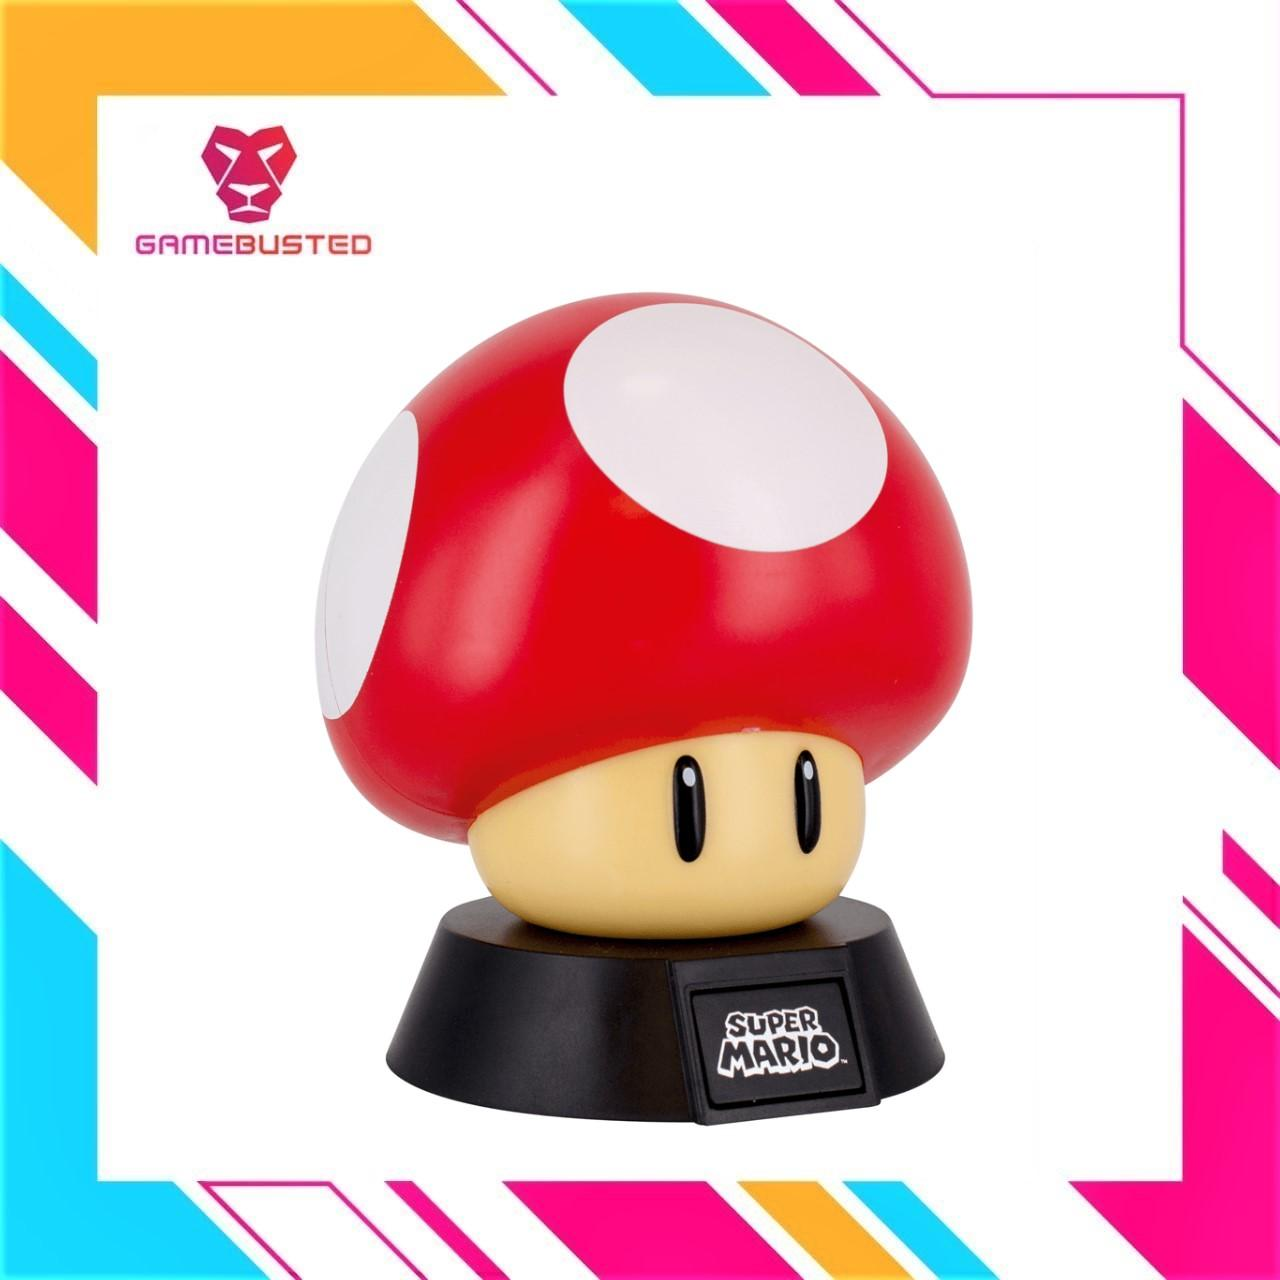 Paladone Nintendo Super Mario Red Mushroom Icon Light (015818)